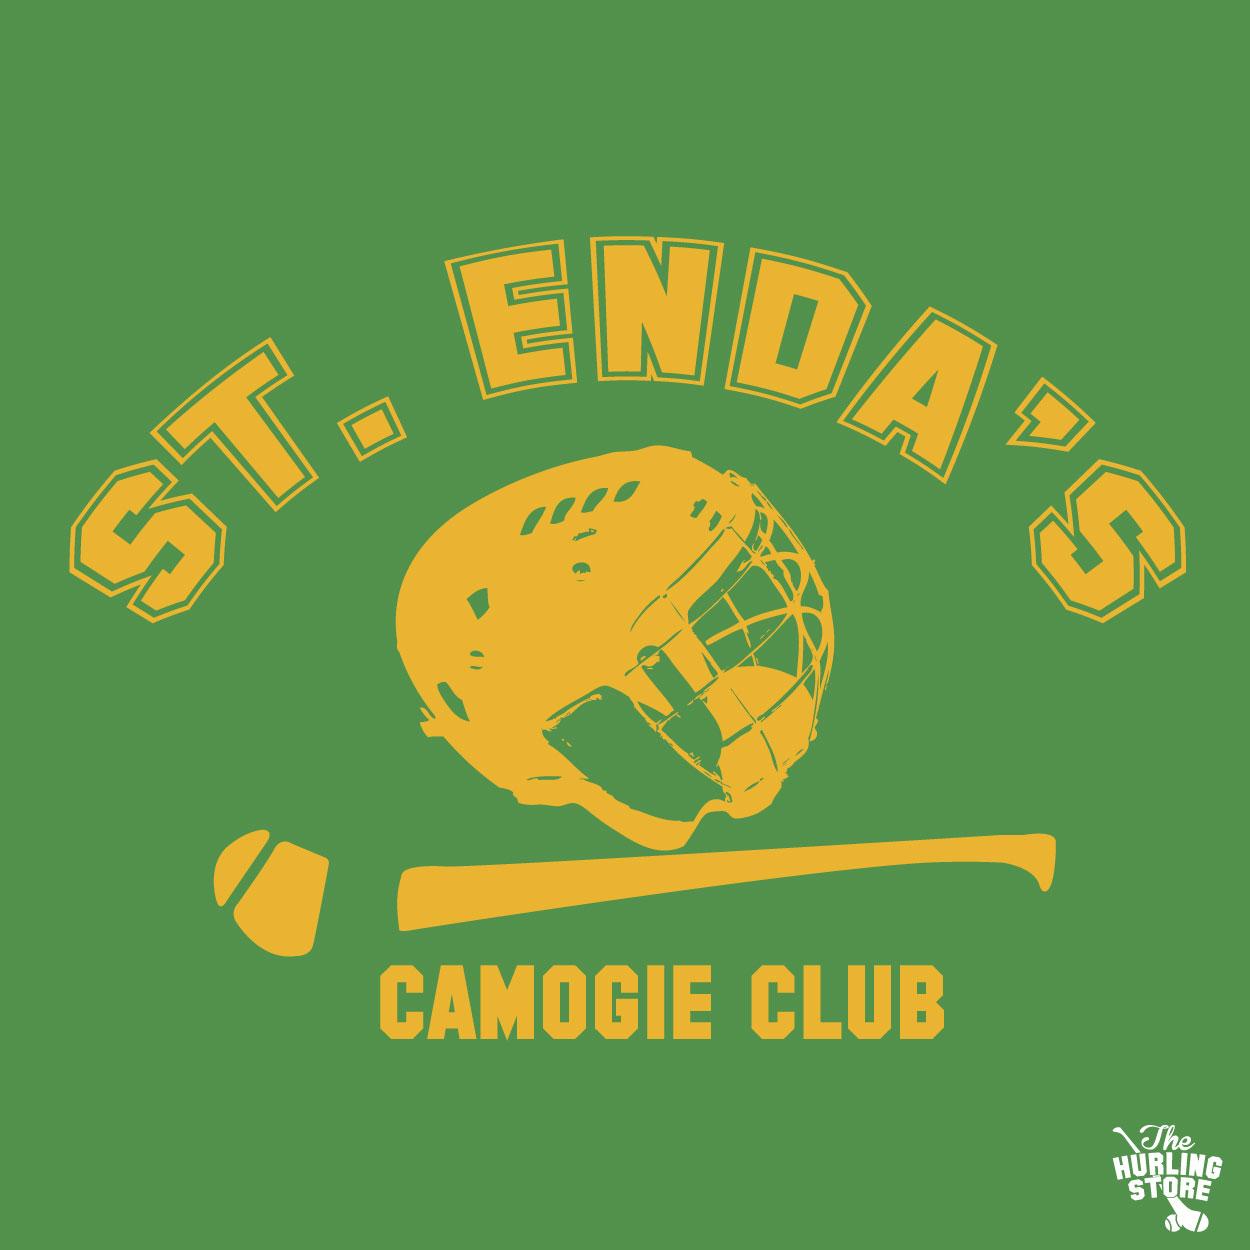 St Enda's Camogie Club